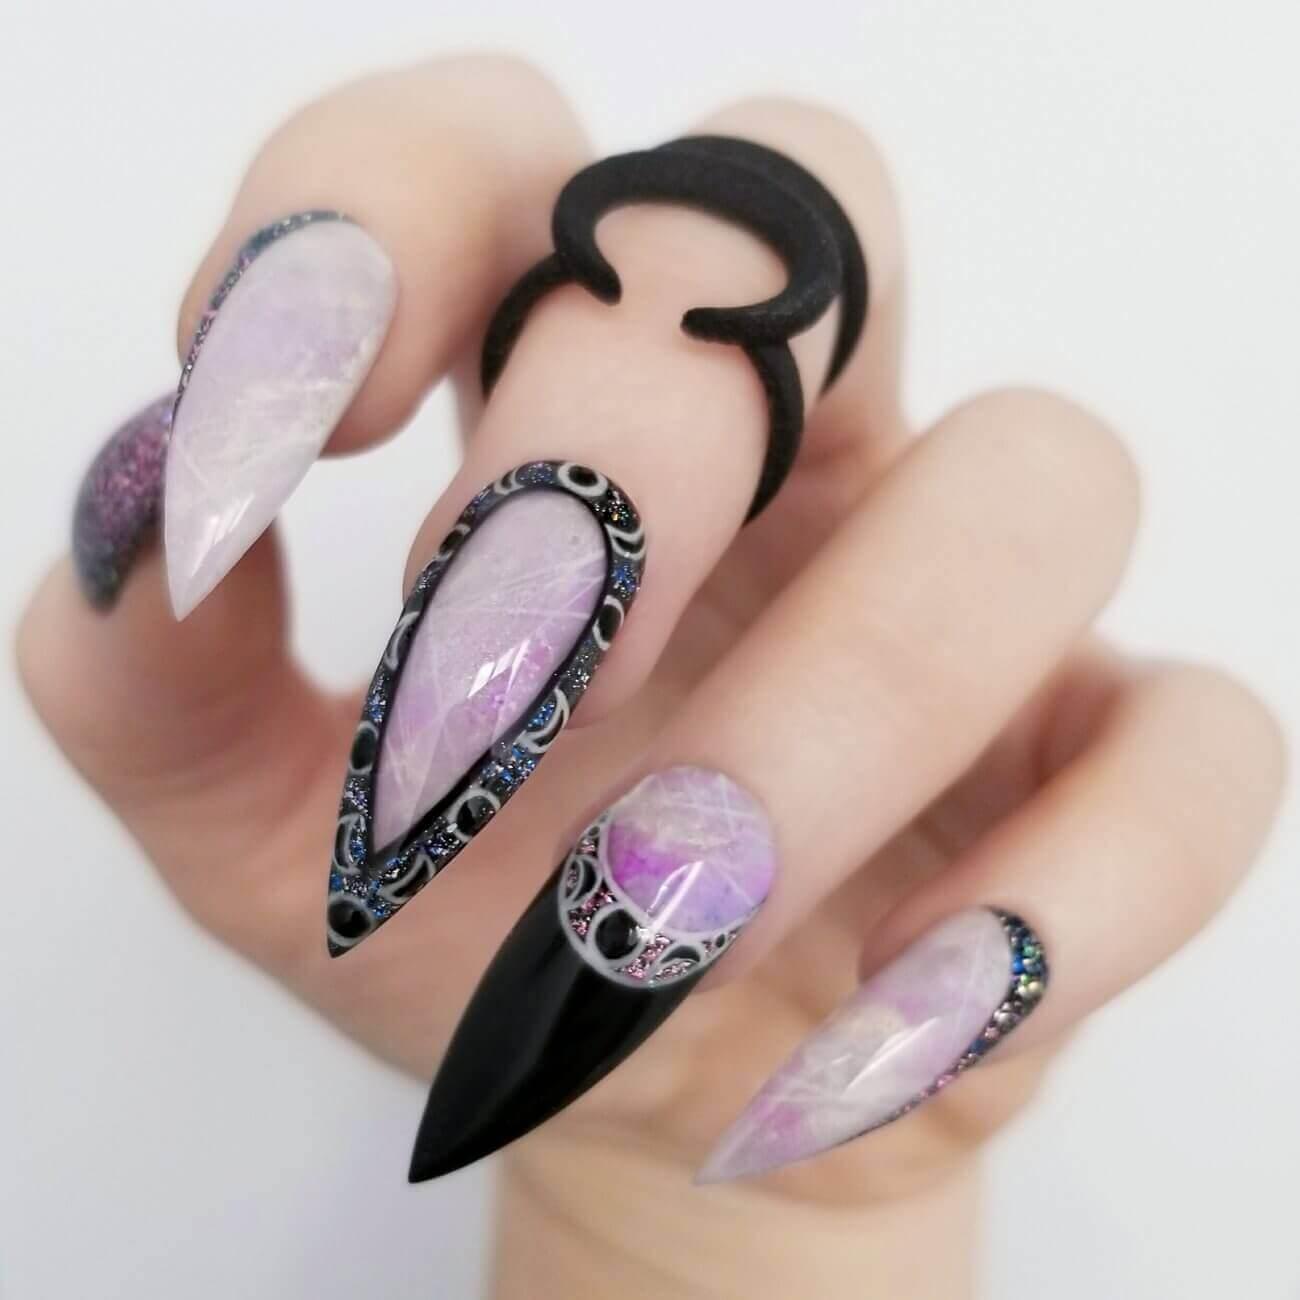 ongles acryliques sorcière halloween